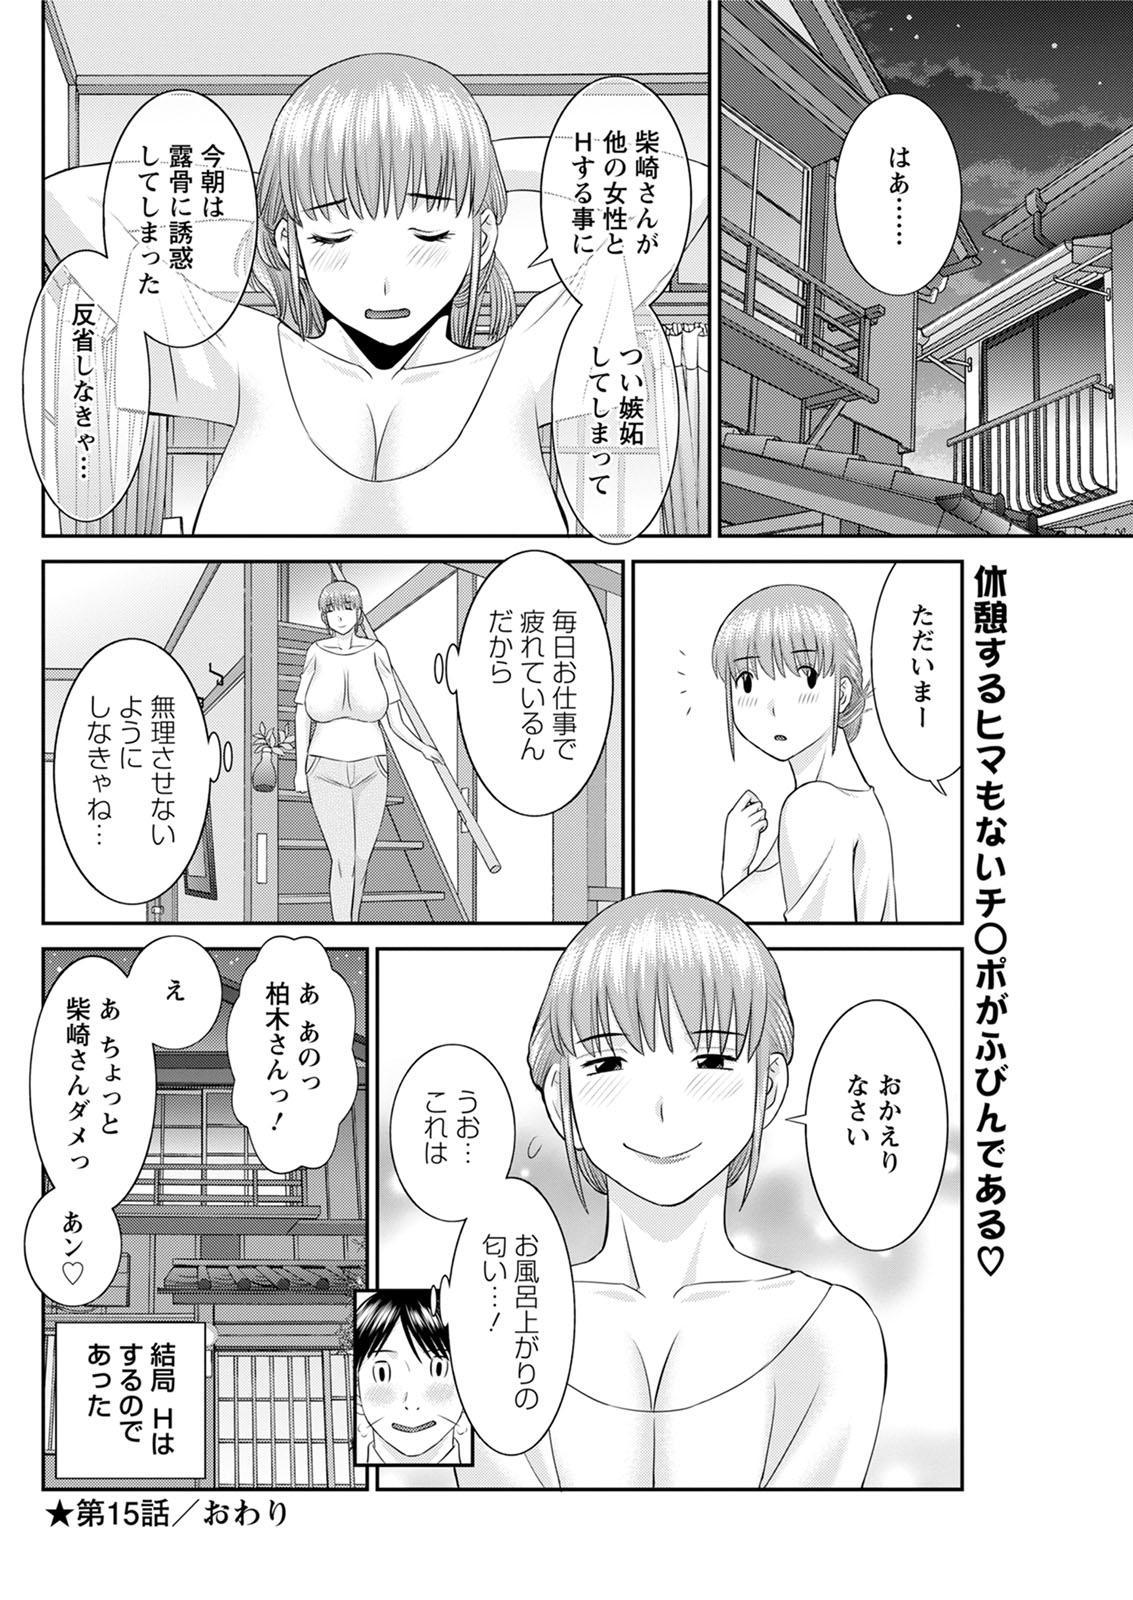 [Kawamori Misaki] Kaikan Hitotsuma Gakuen Ch. 1-6, 8-20 [Digital] 256